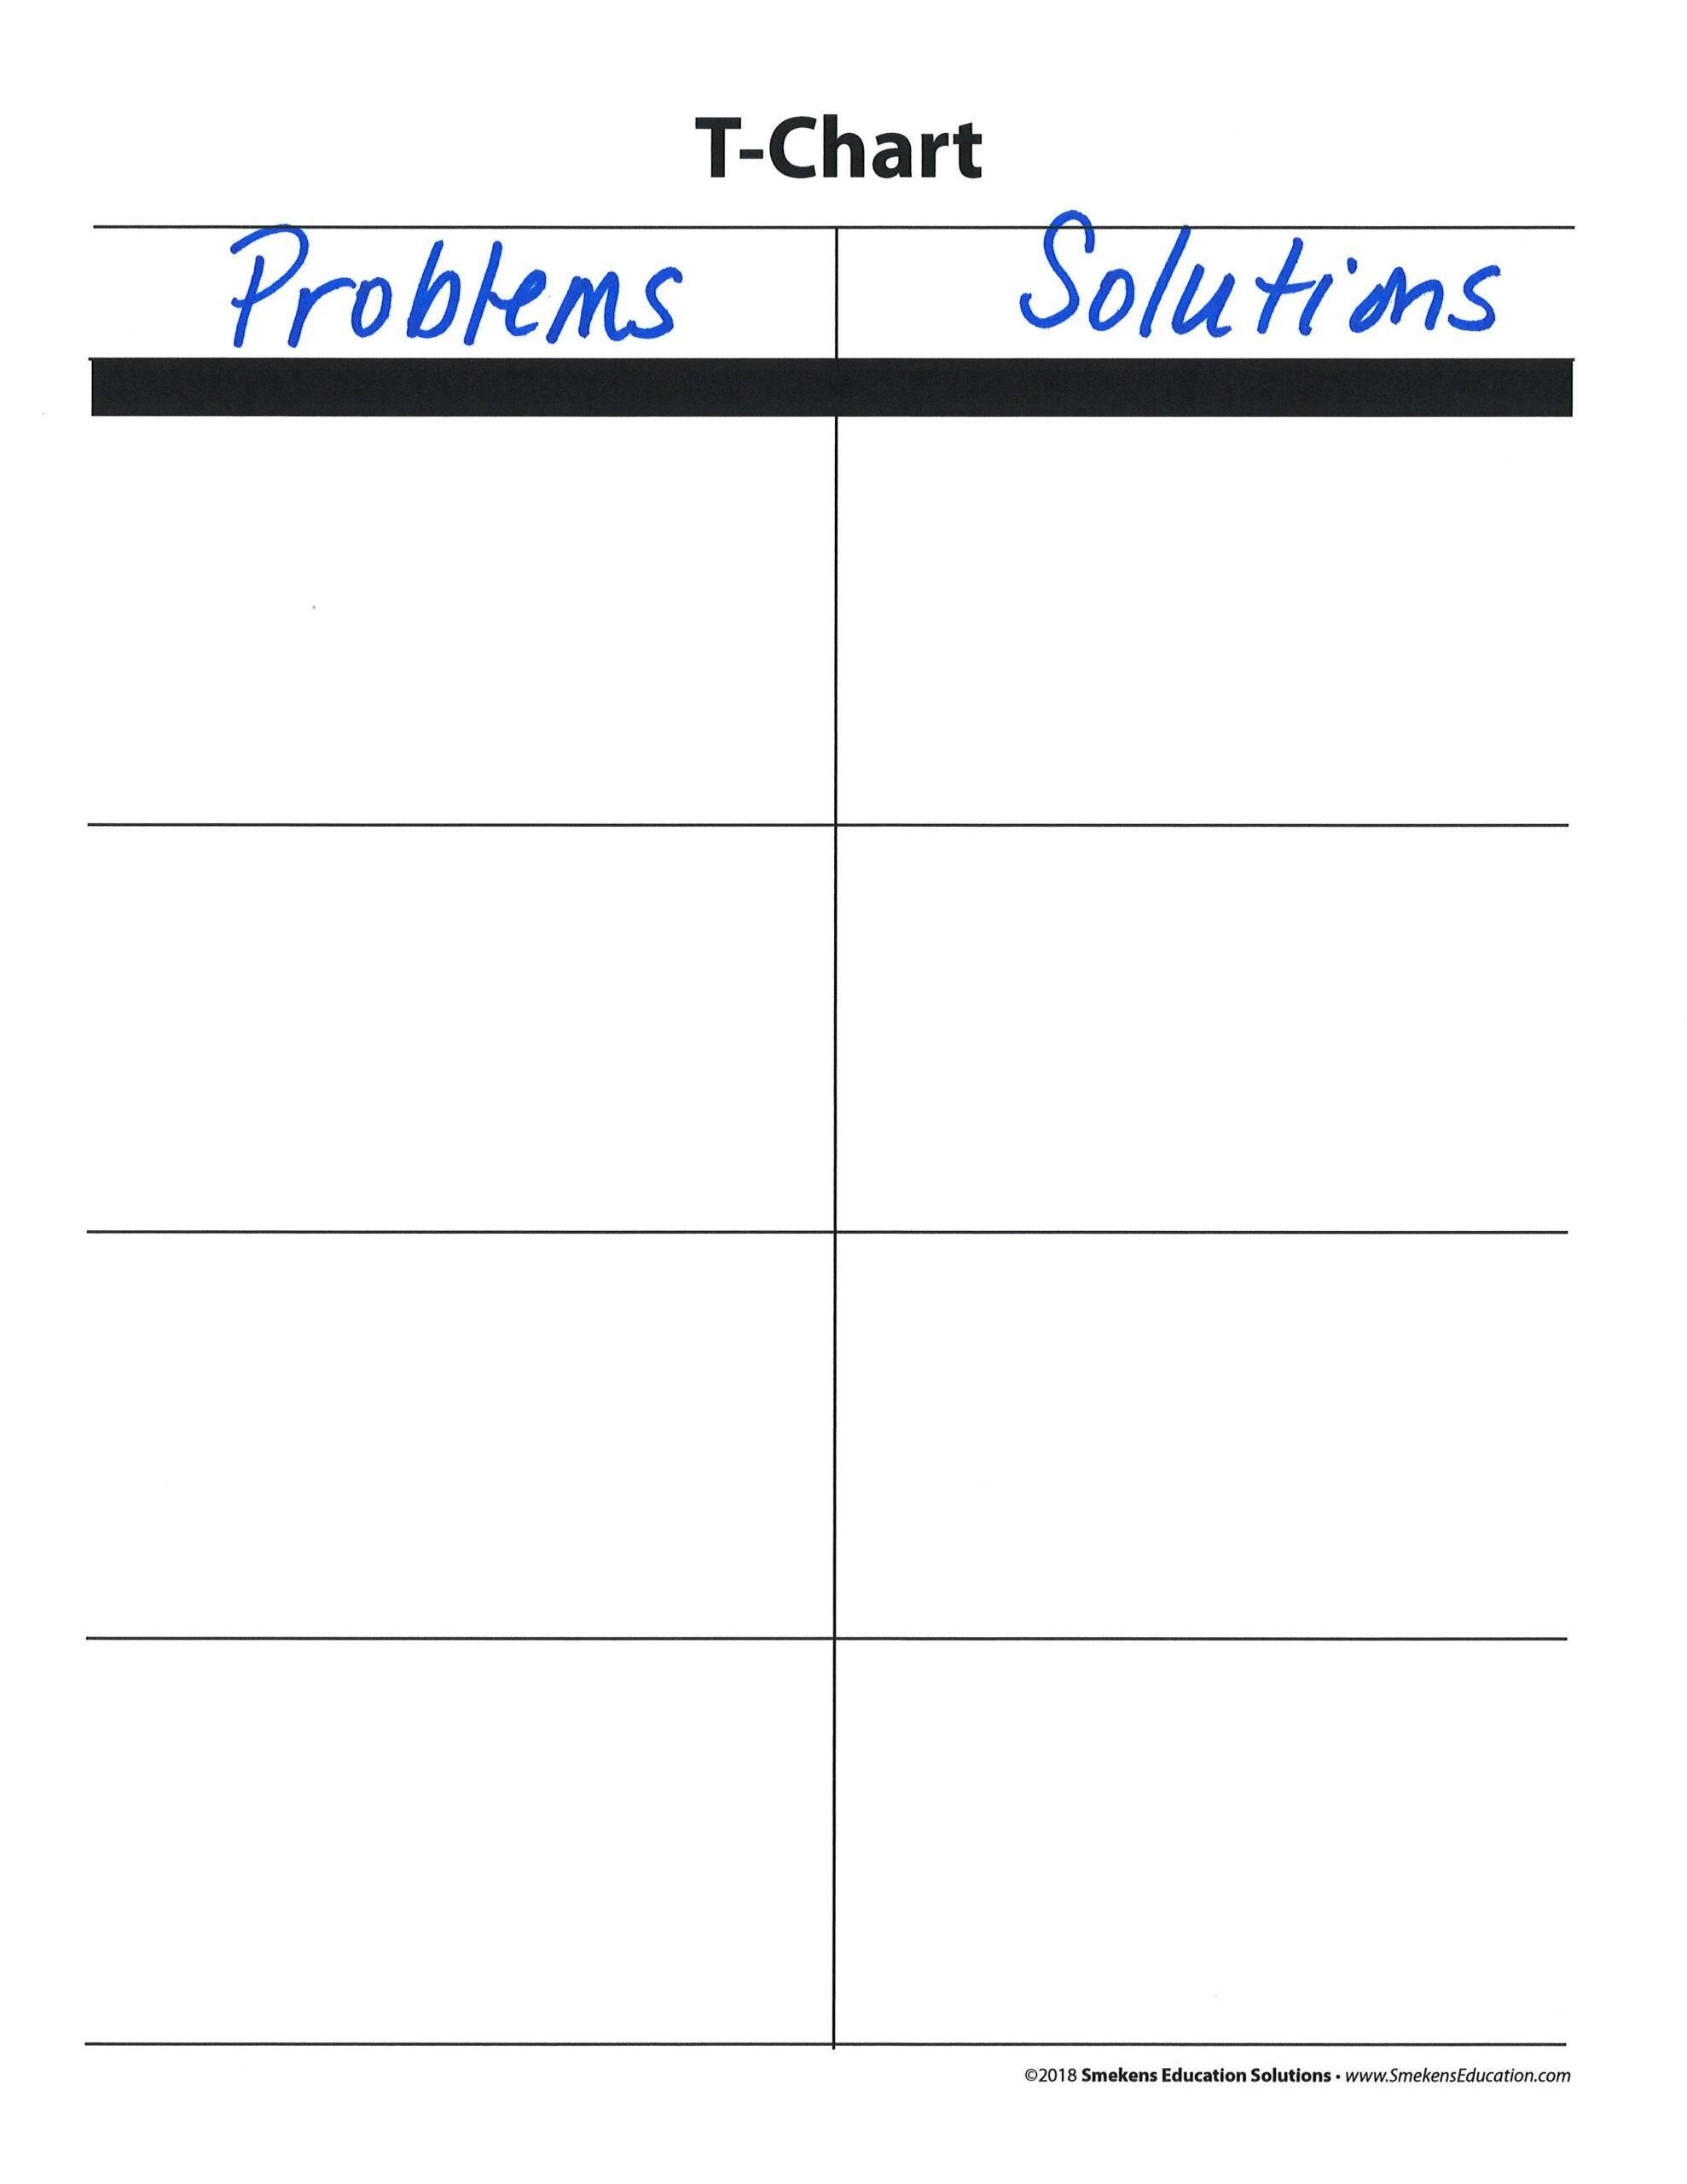 Problem-Solutions T-Chart